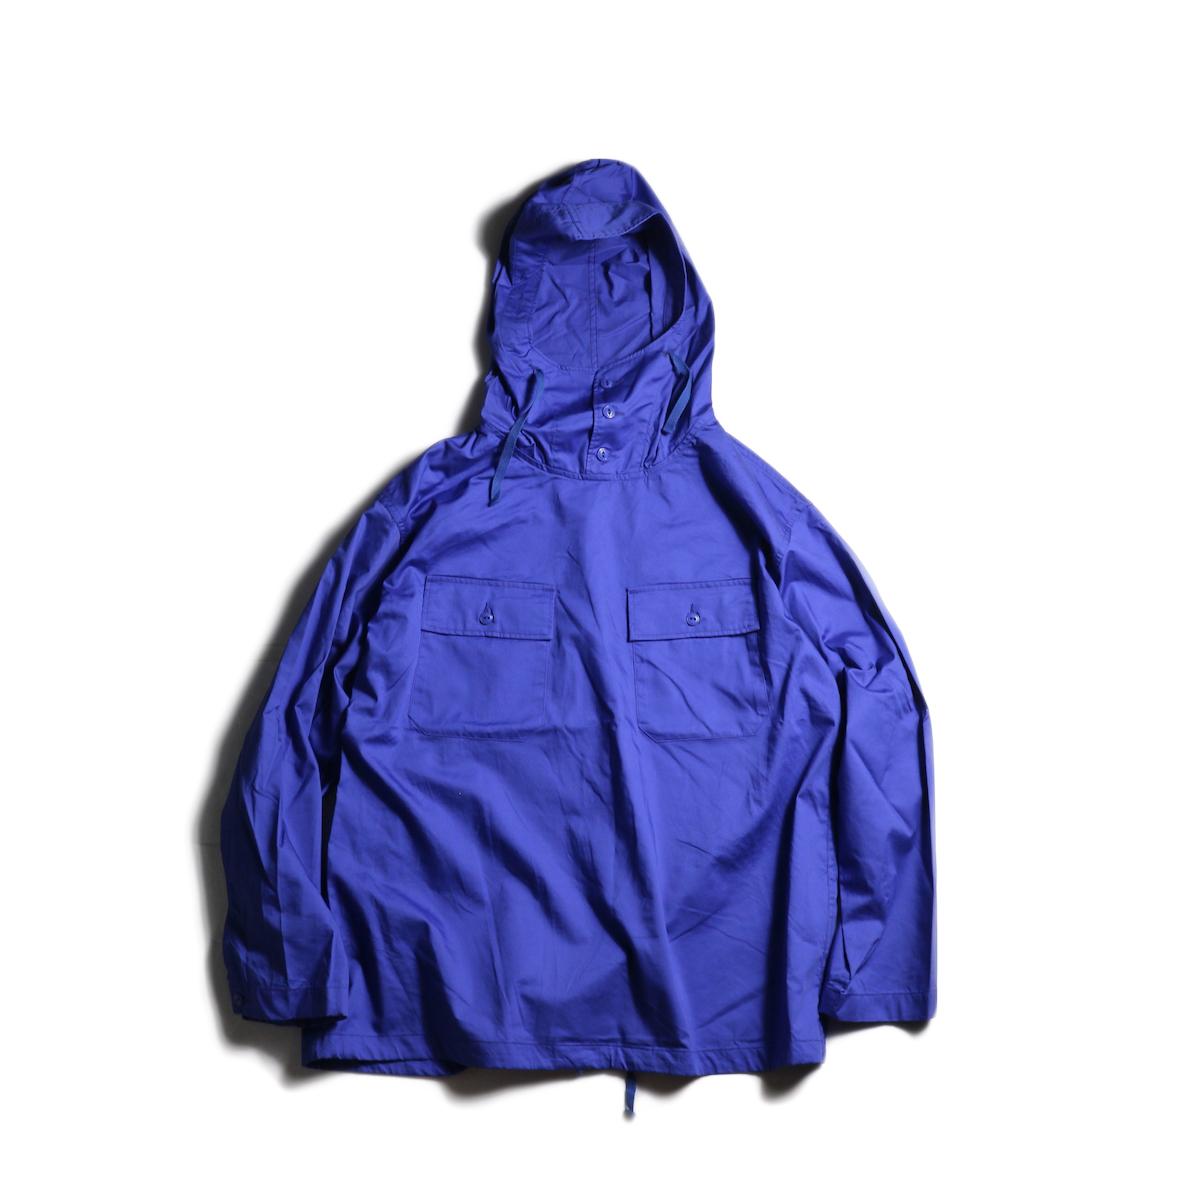 Engineered Garments / Cagoule Shirt -Cotton Nano Twill (Royal)